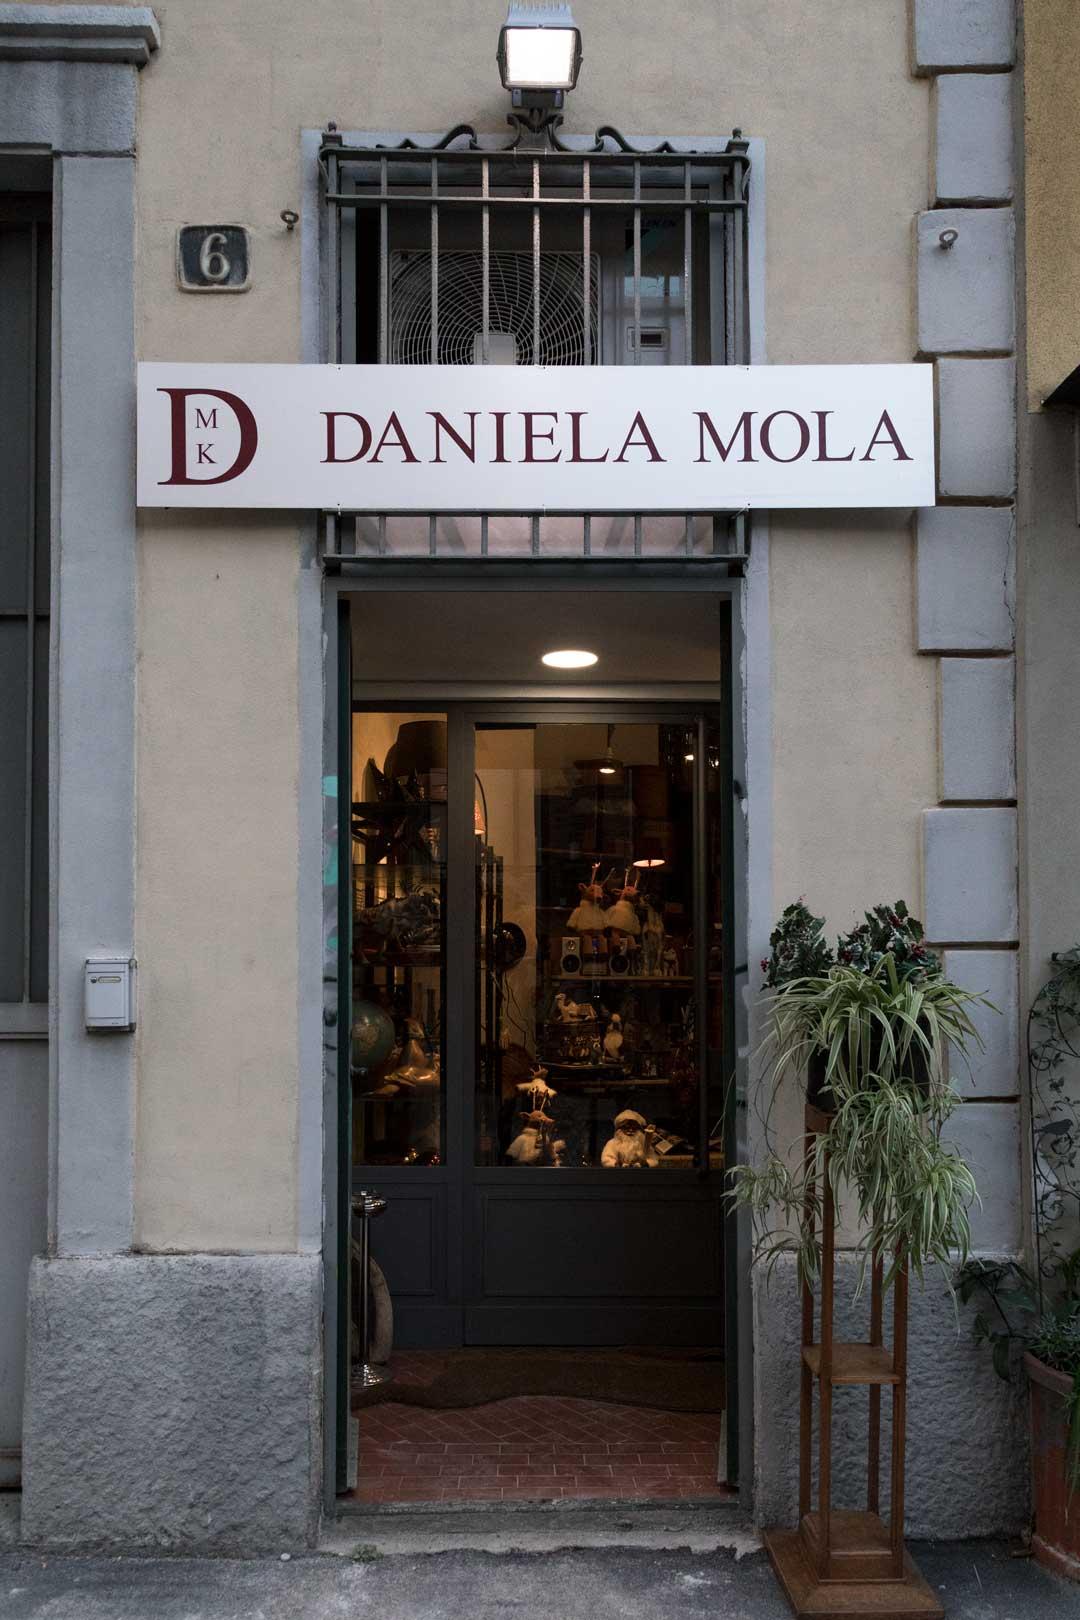 DMK - Daniela Mola   Milano